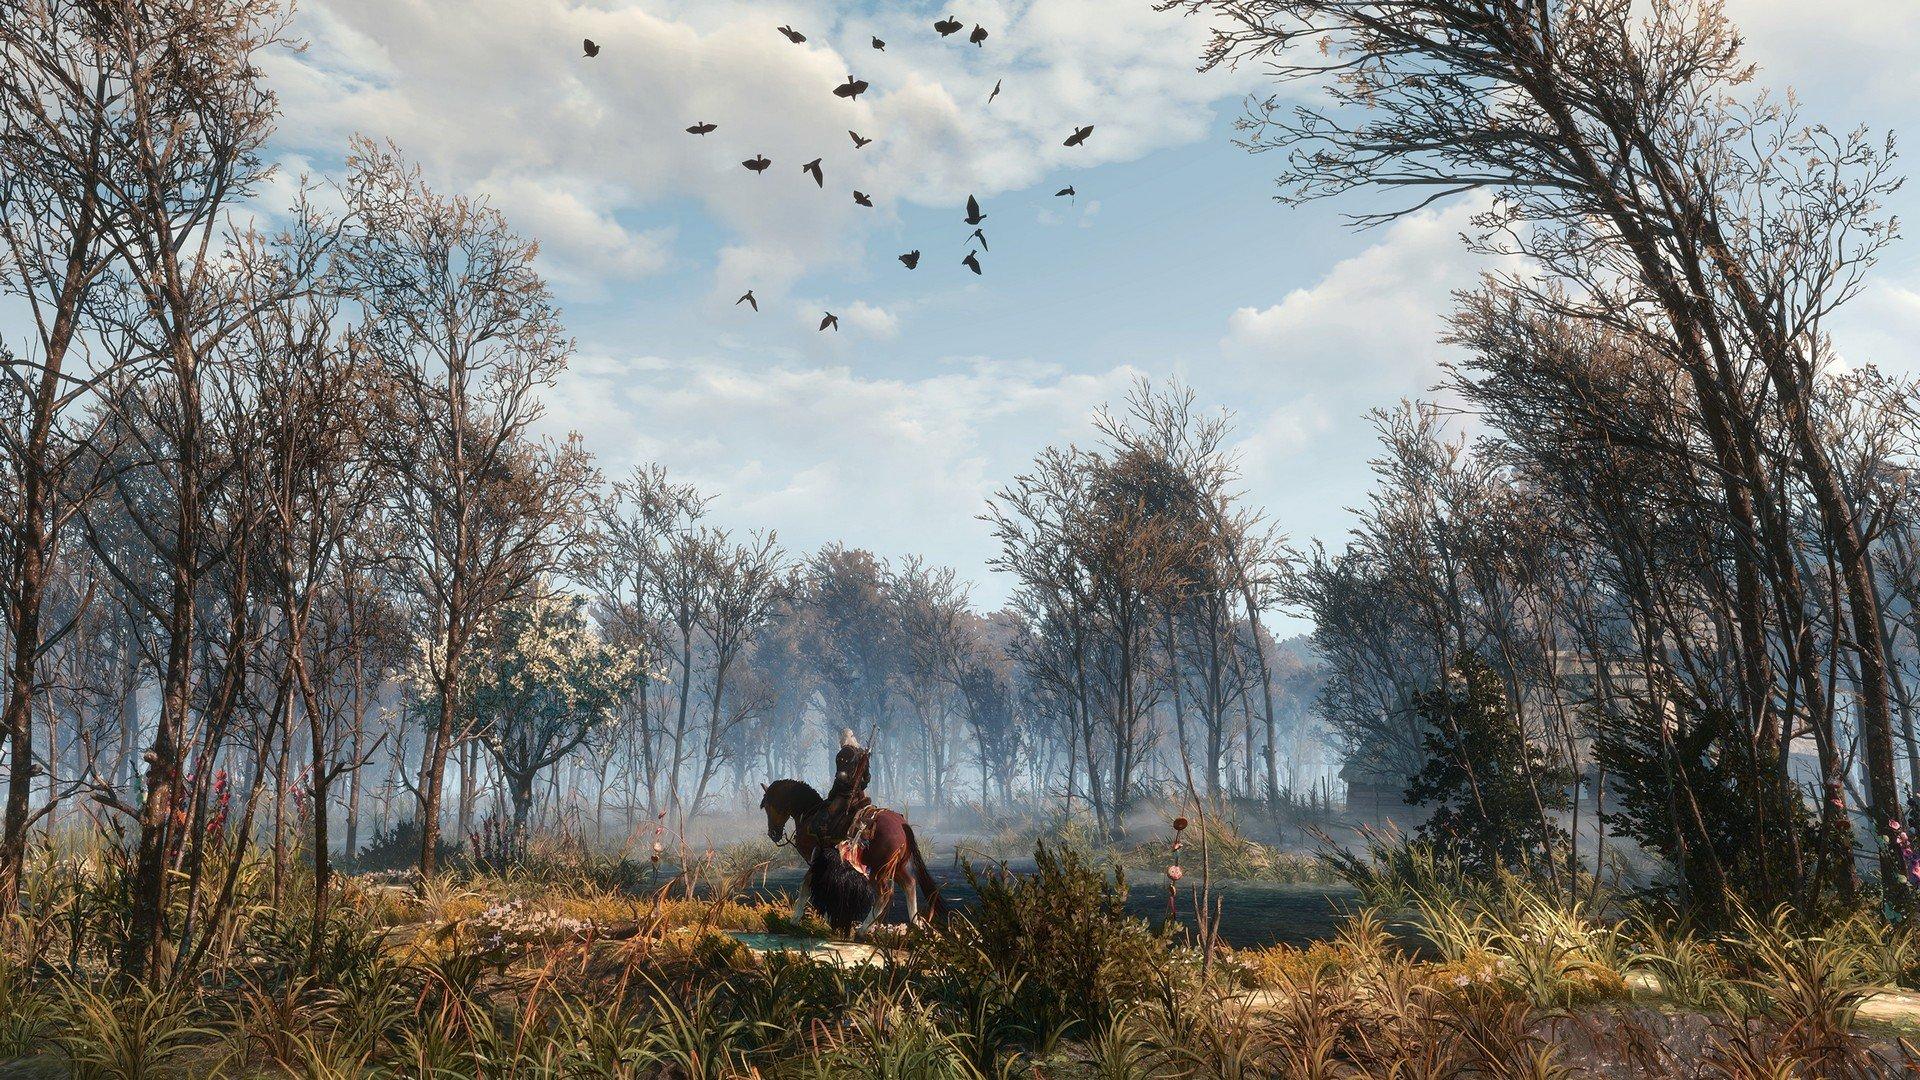 Ps4 Wallpaper Hd The Witcher 3 Wild Hunt Review Quot Easily Beats Elder